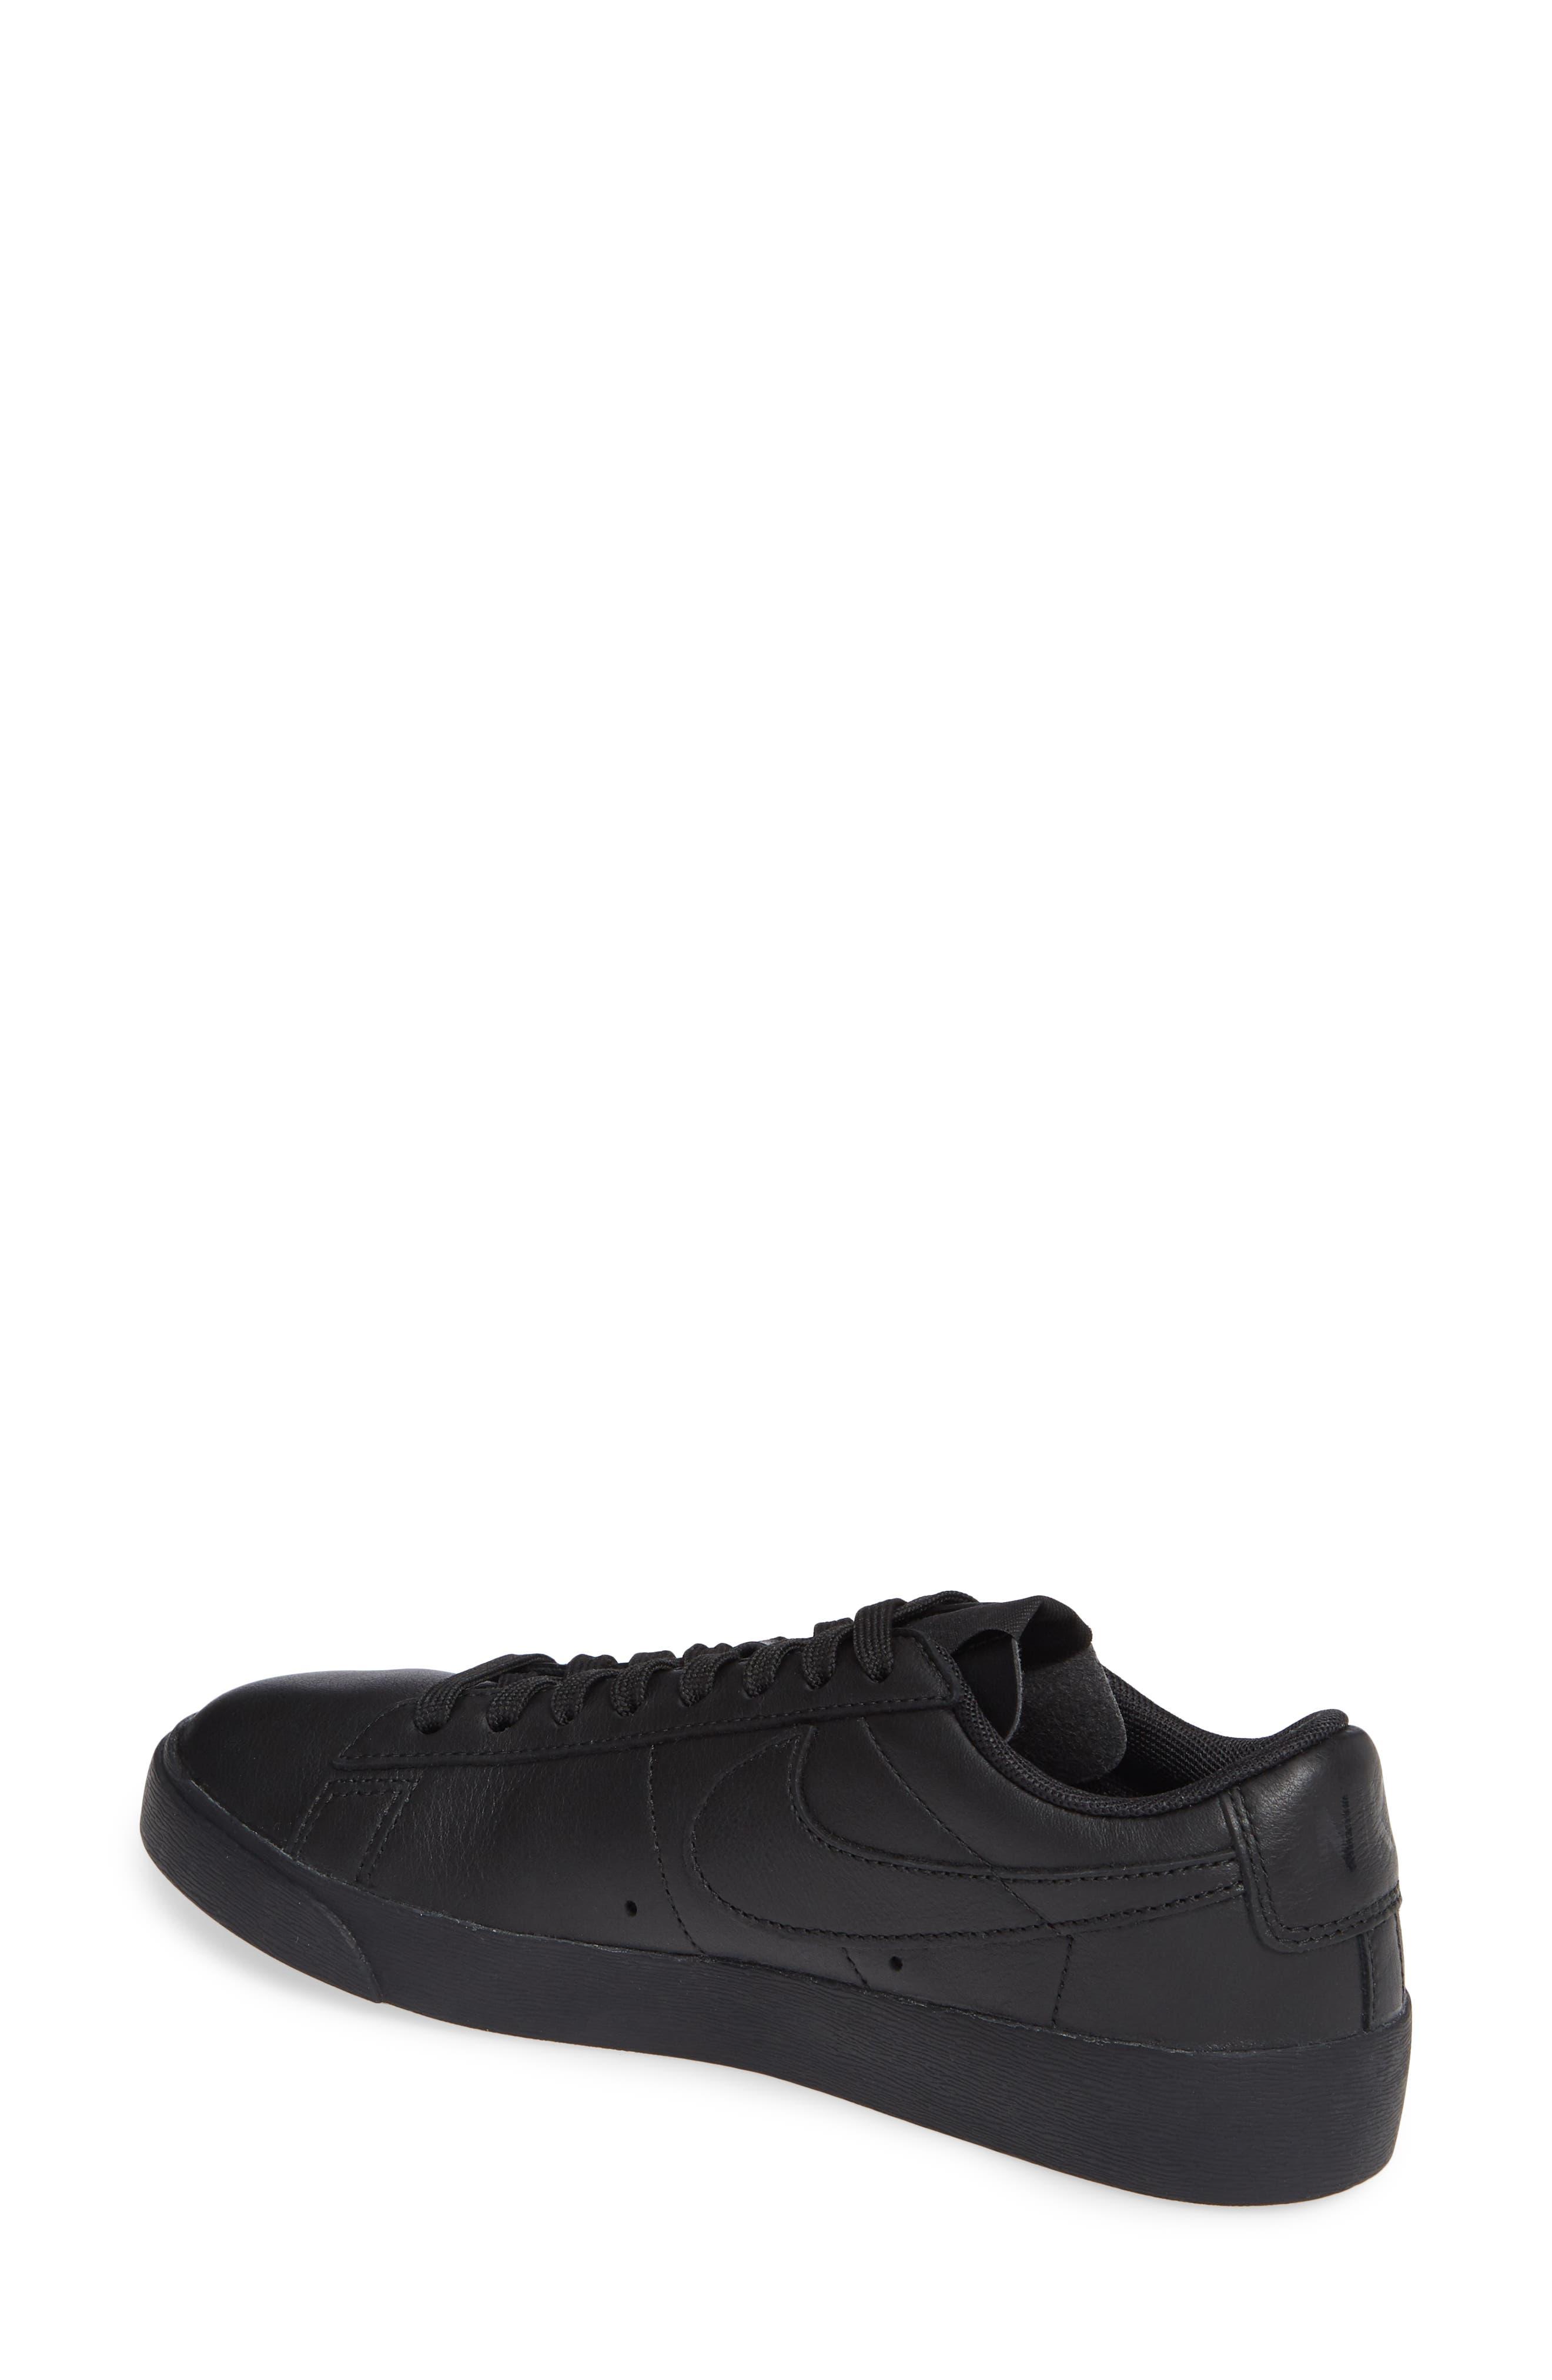 Blazer Low SE Sneaker,                             Alternate thumbnail 2, color,                             BLACK/ BLACK-BLACK